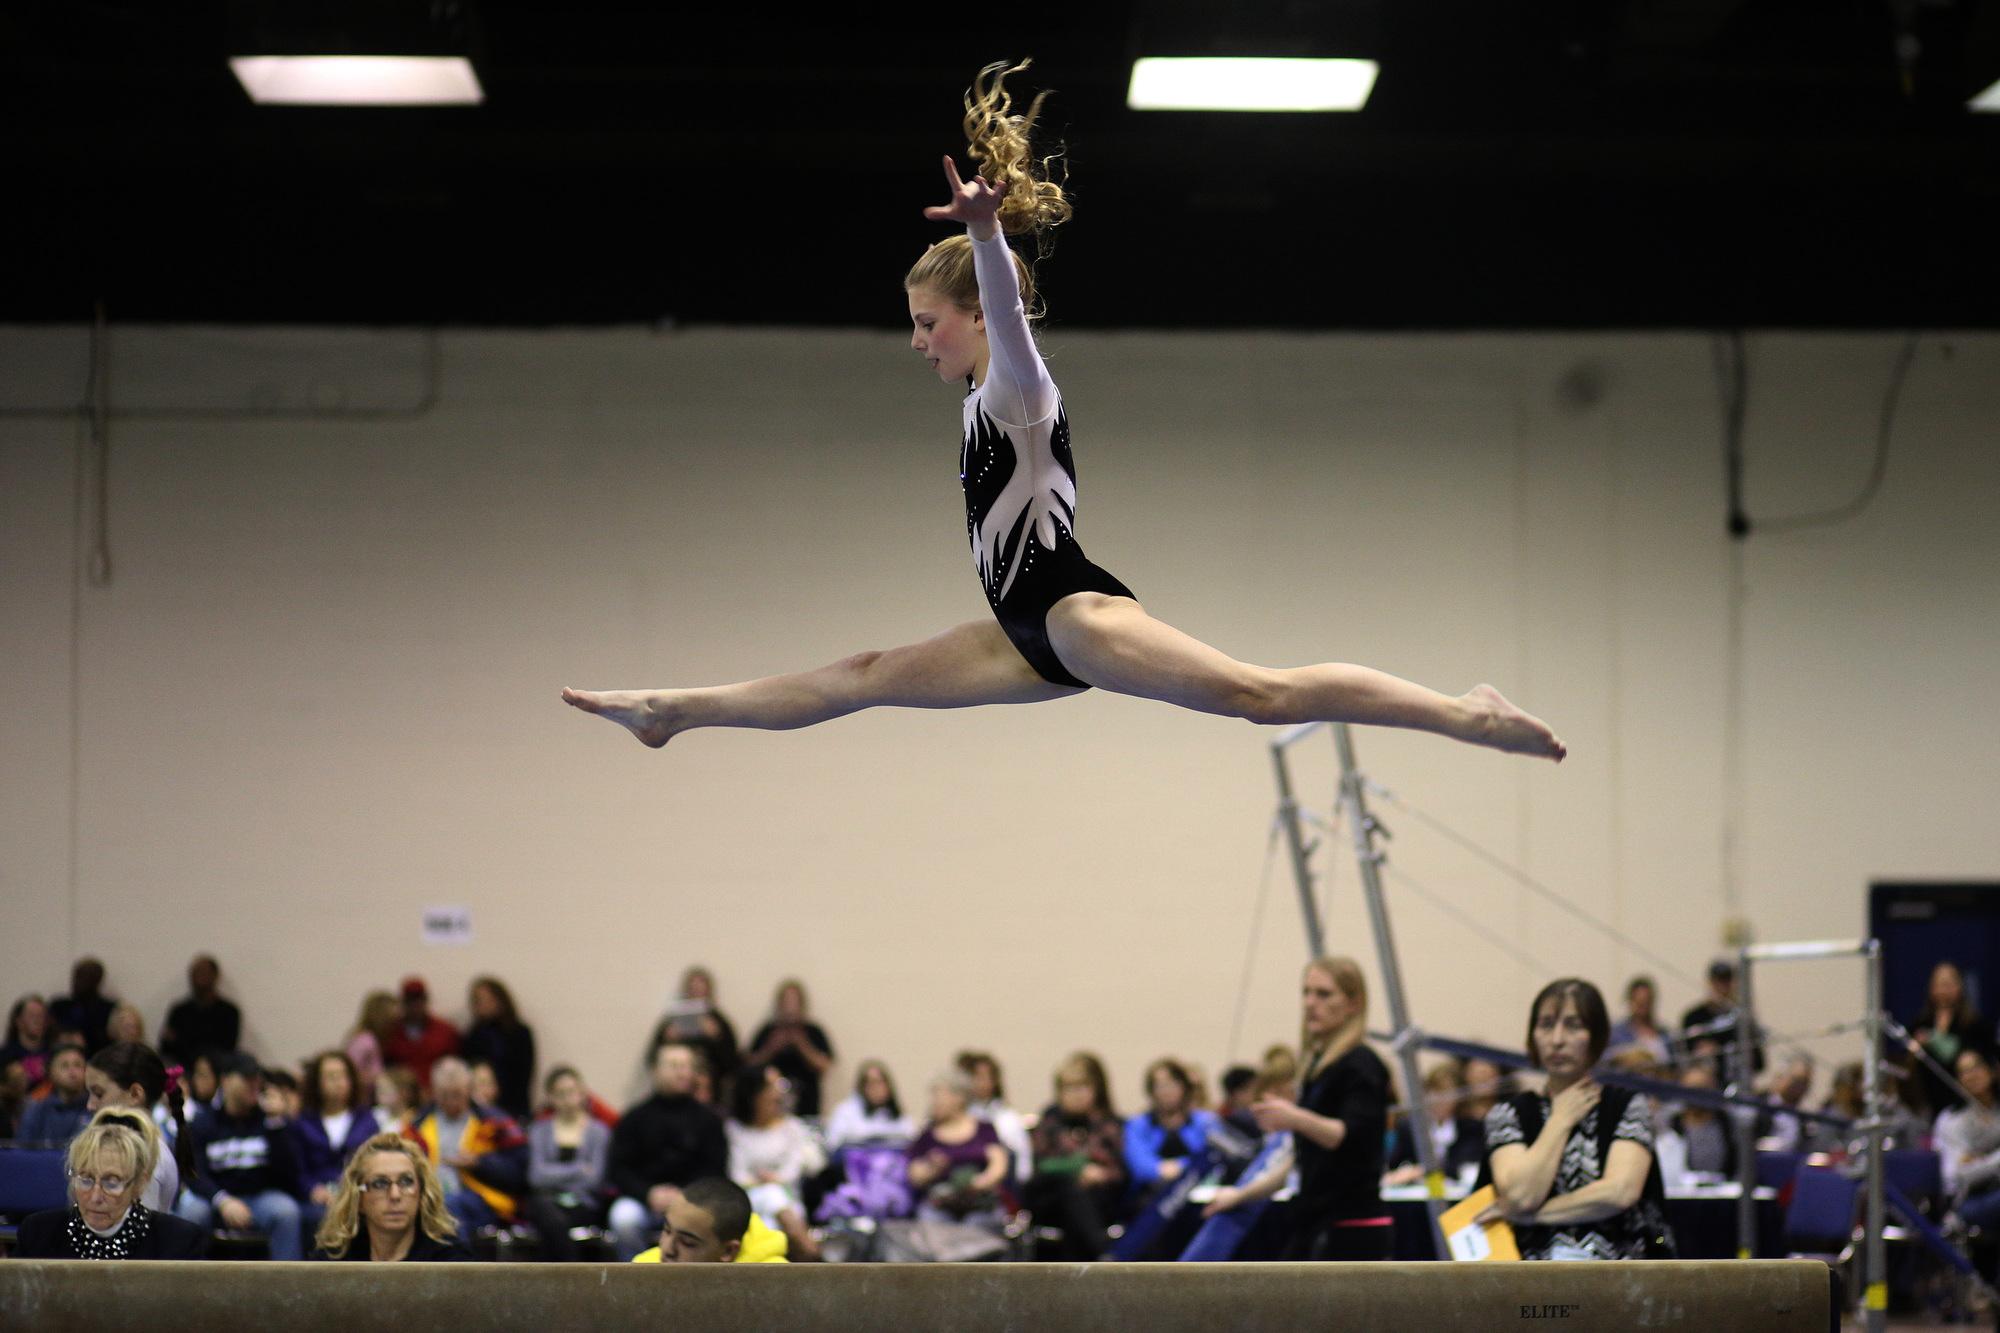 010214_Clayton_Gymnastics_13414.JPG